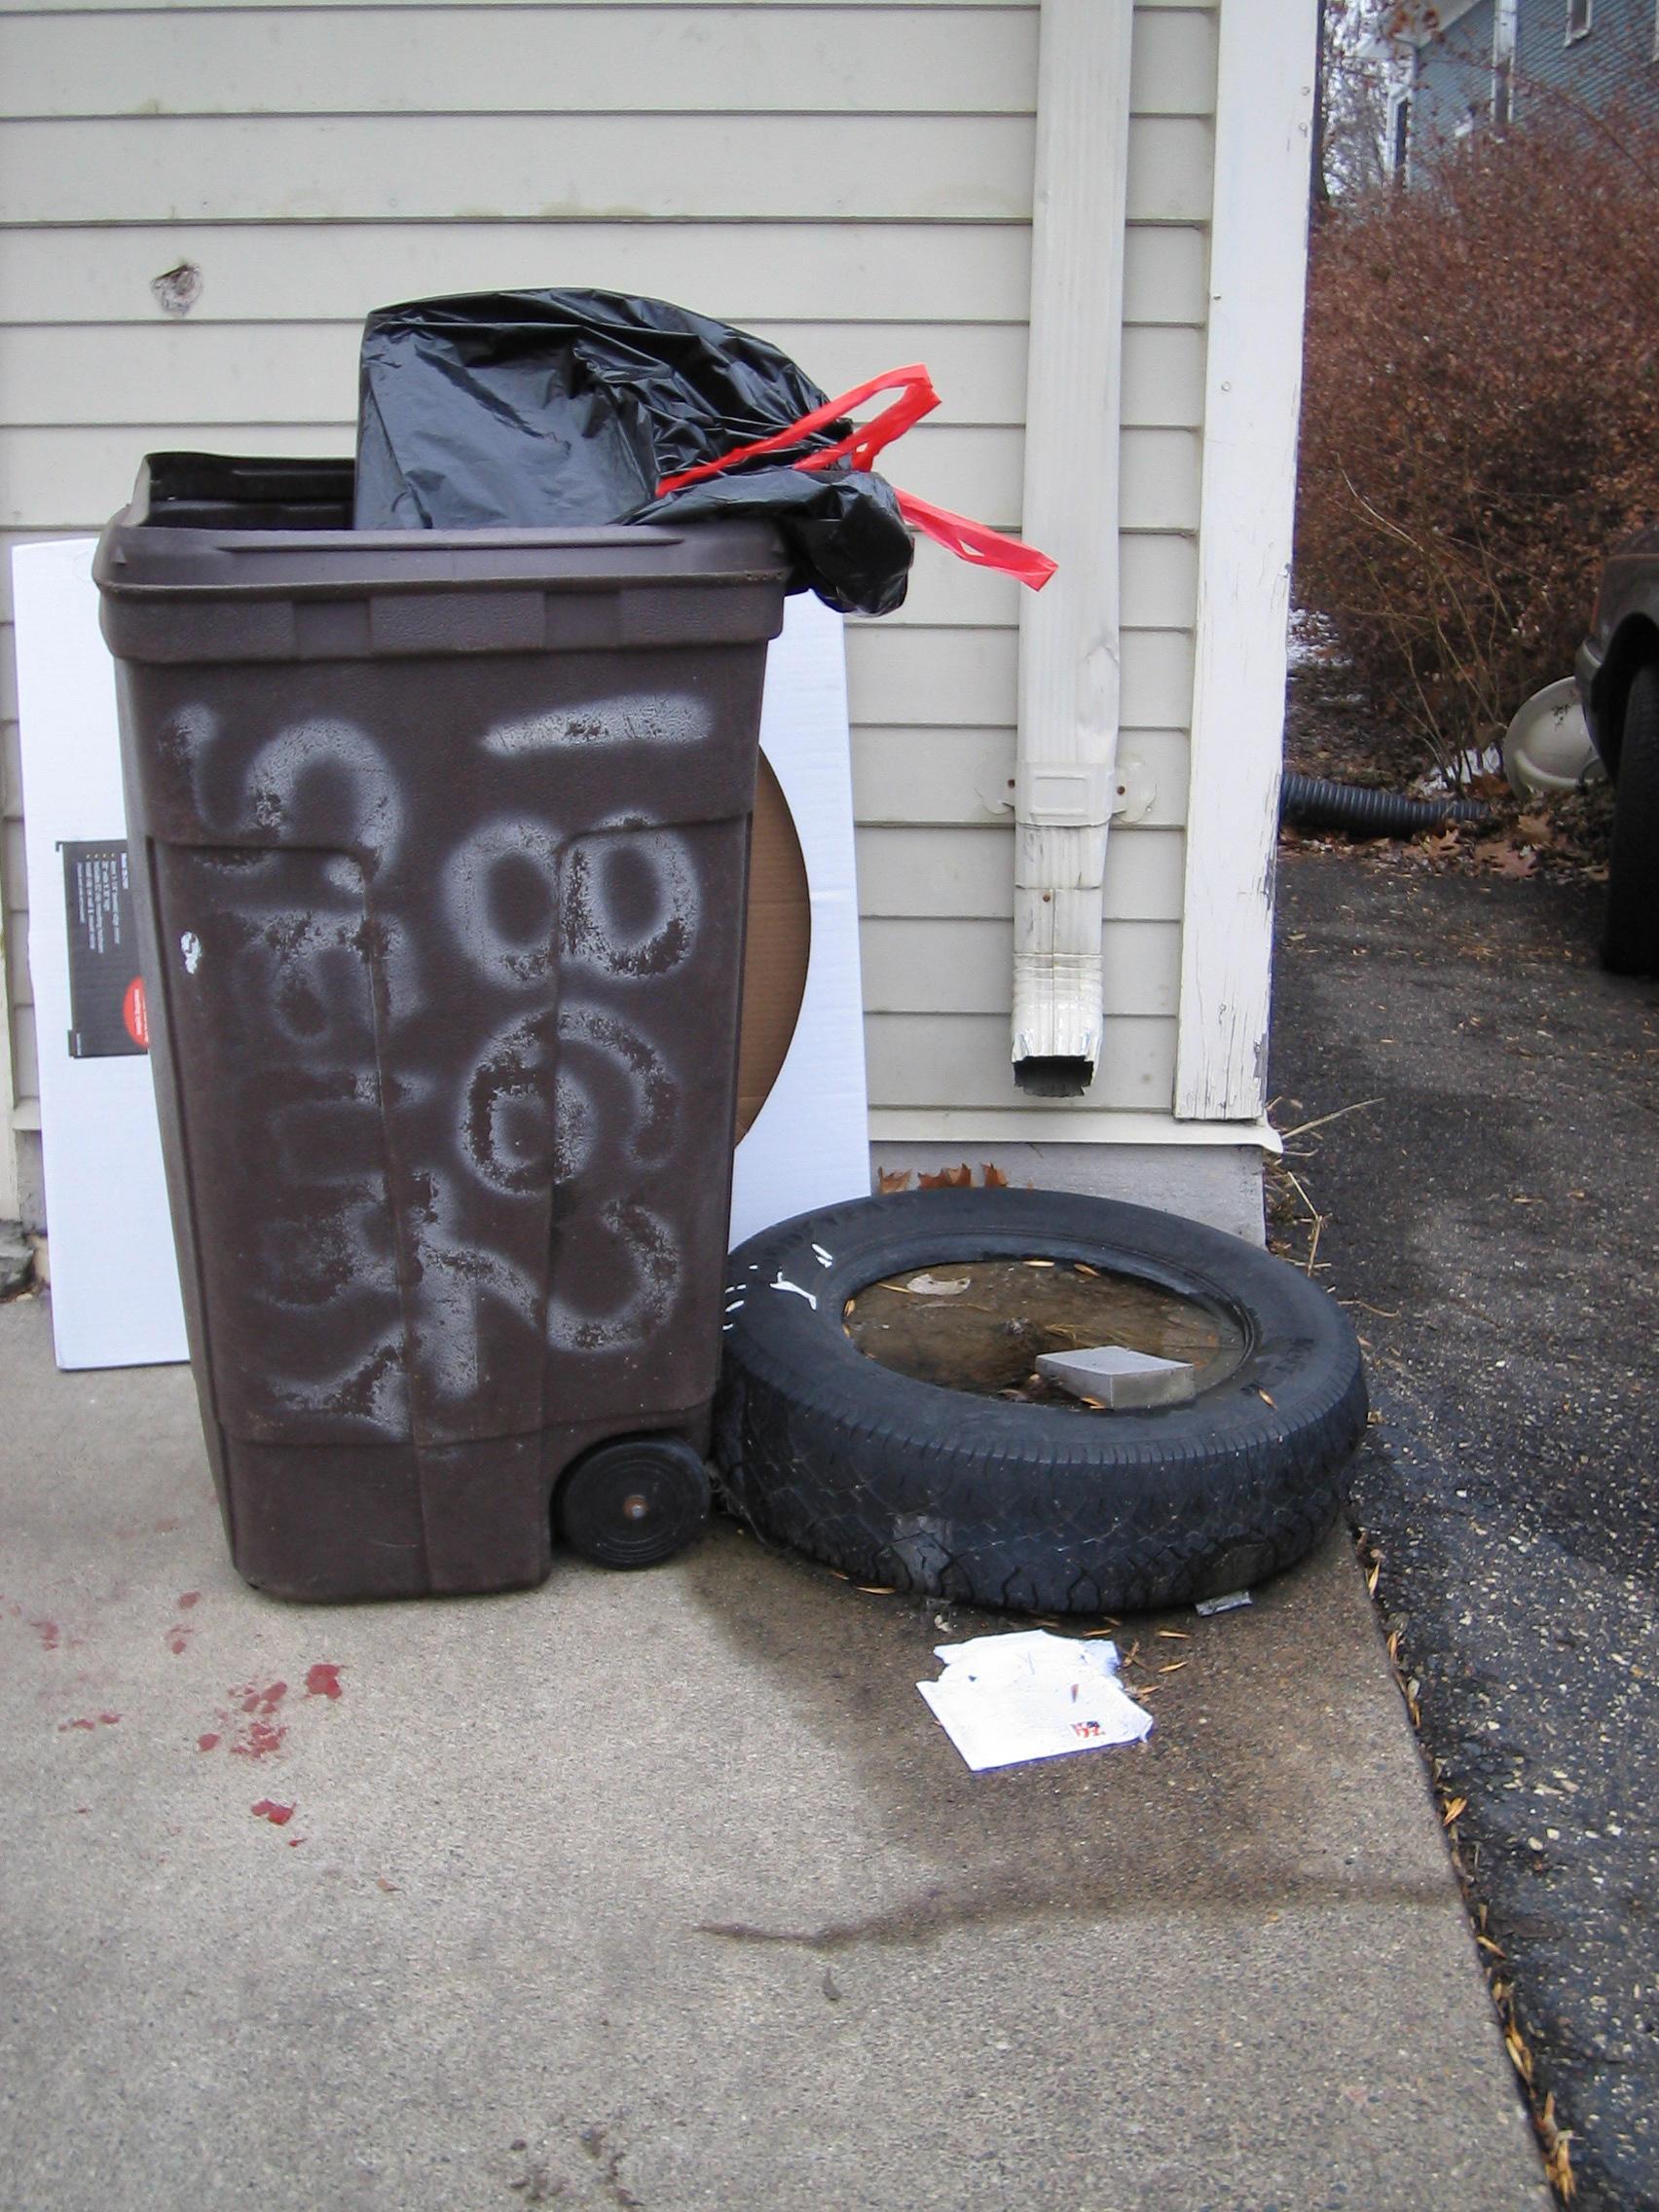 Trash 1 by floatingtrem-stock